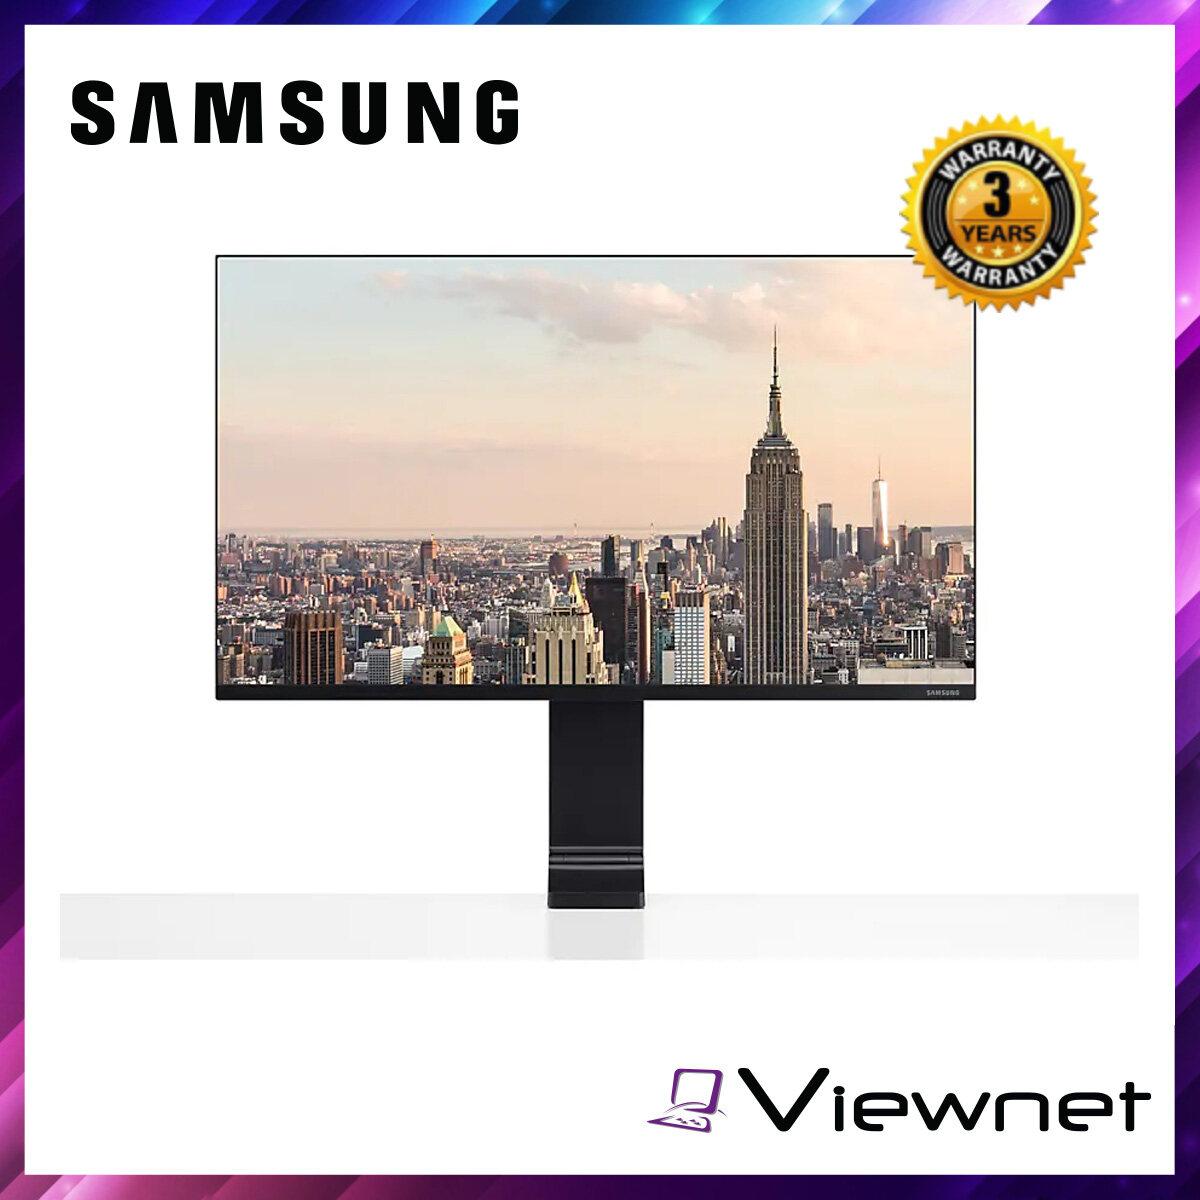 Samsung 27  LS27R750QEEXXM 144Hz WQHD Clamp-Type Monitor - Space-Saving Design Malaysia